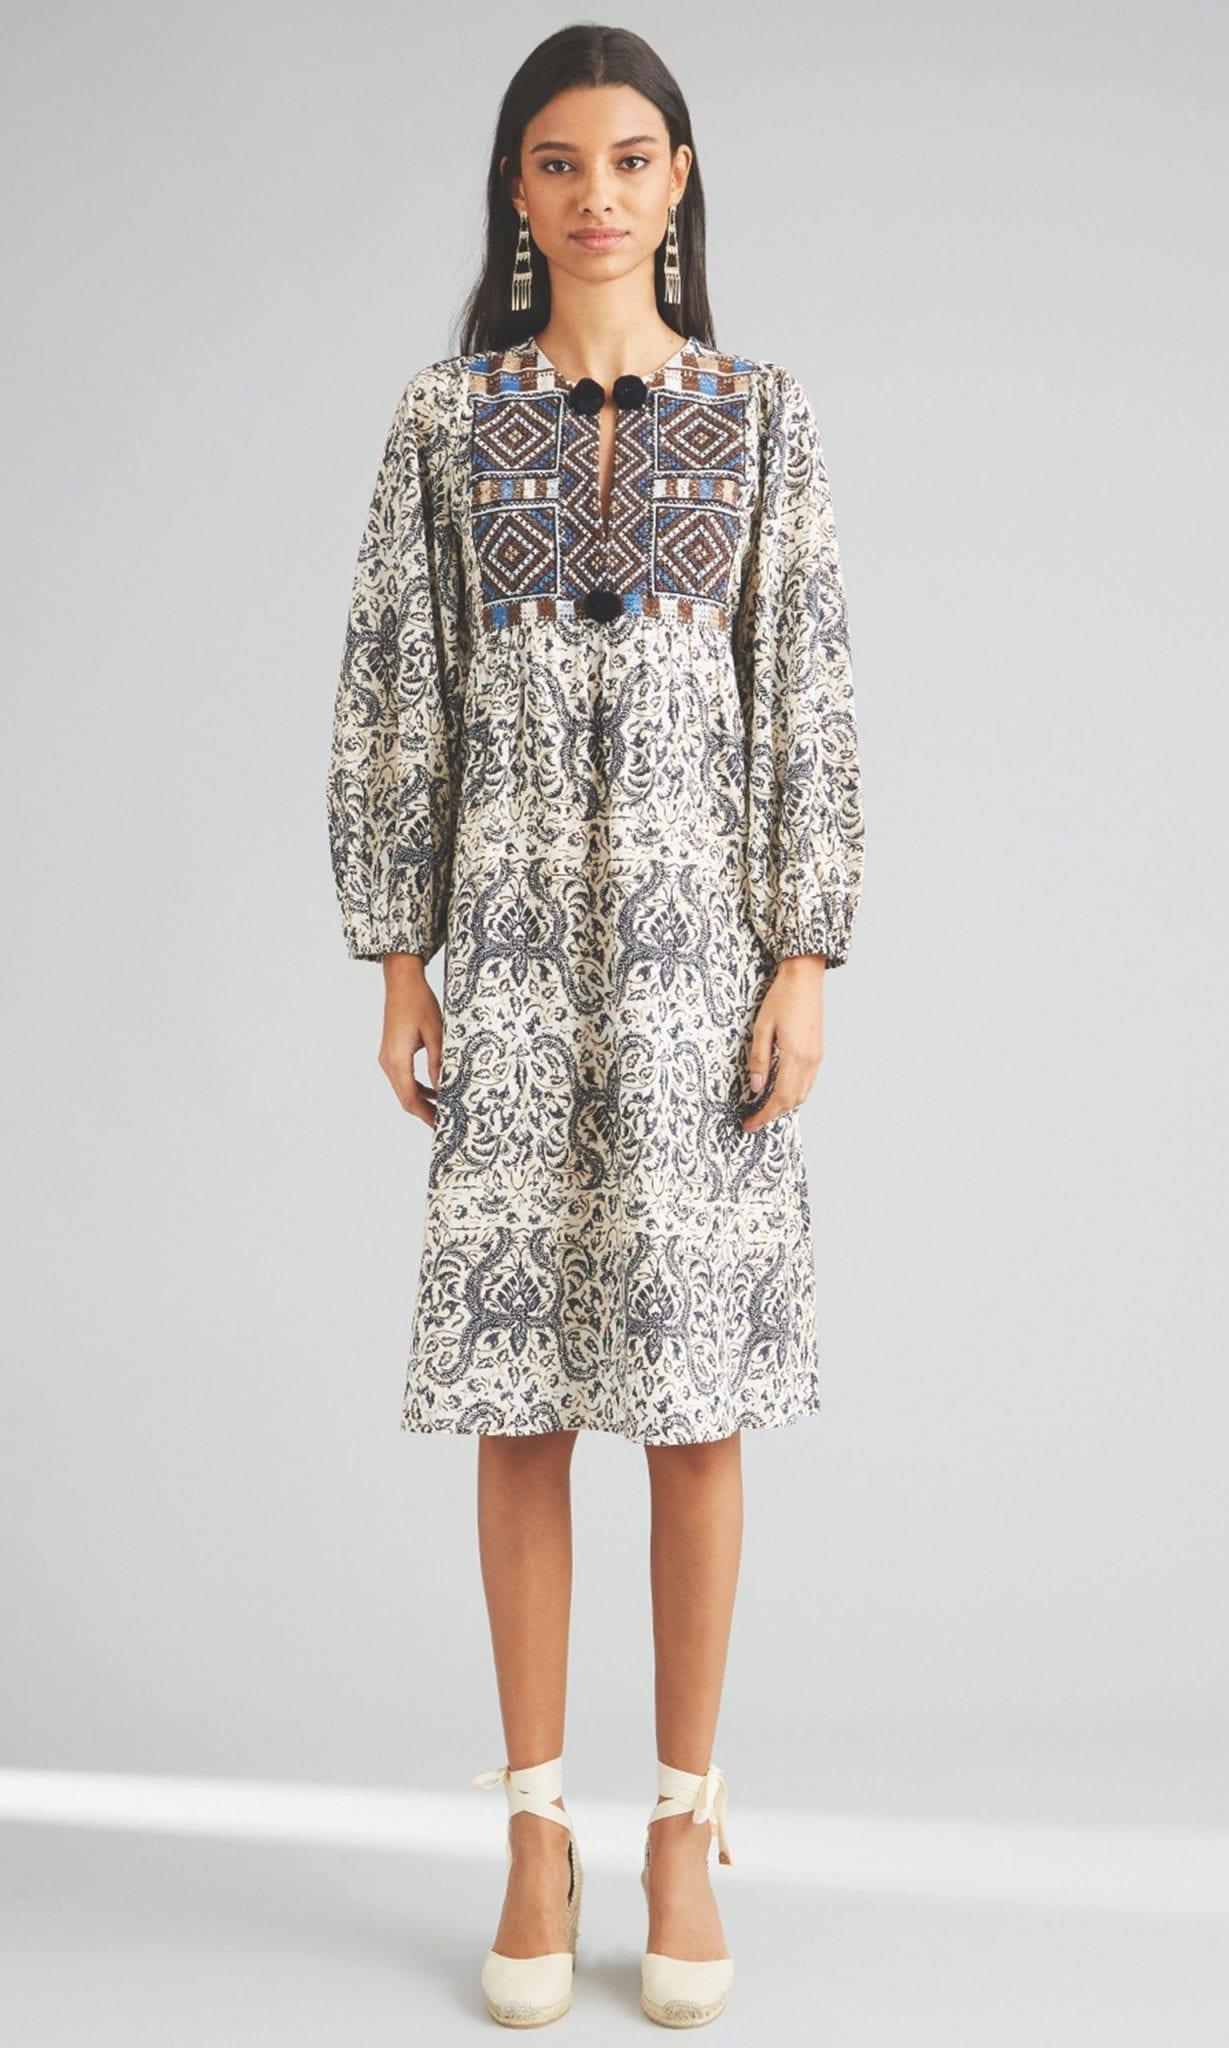 FIGUE Lucie Pom-Pom Cotton Midi Dress